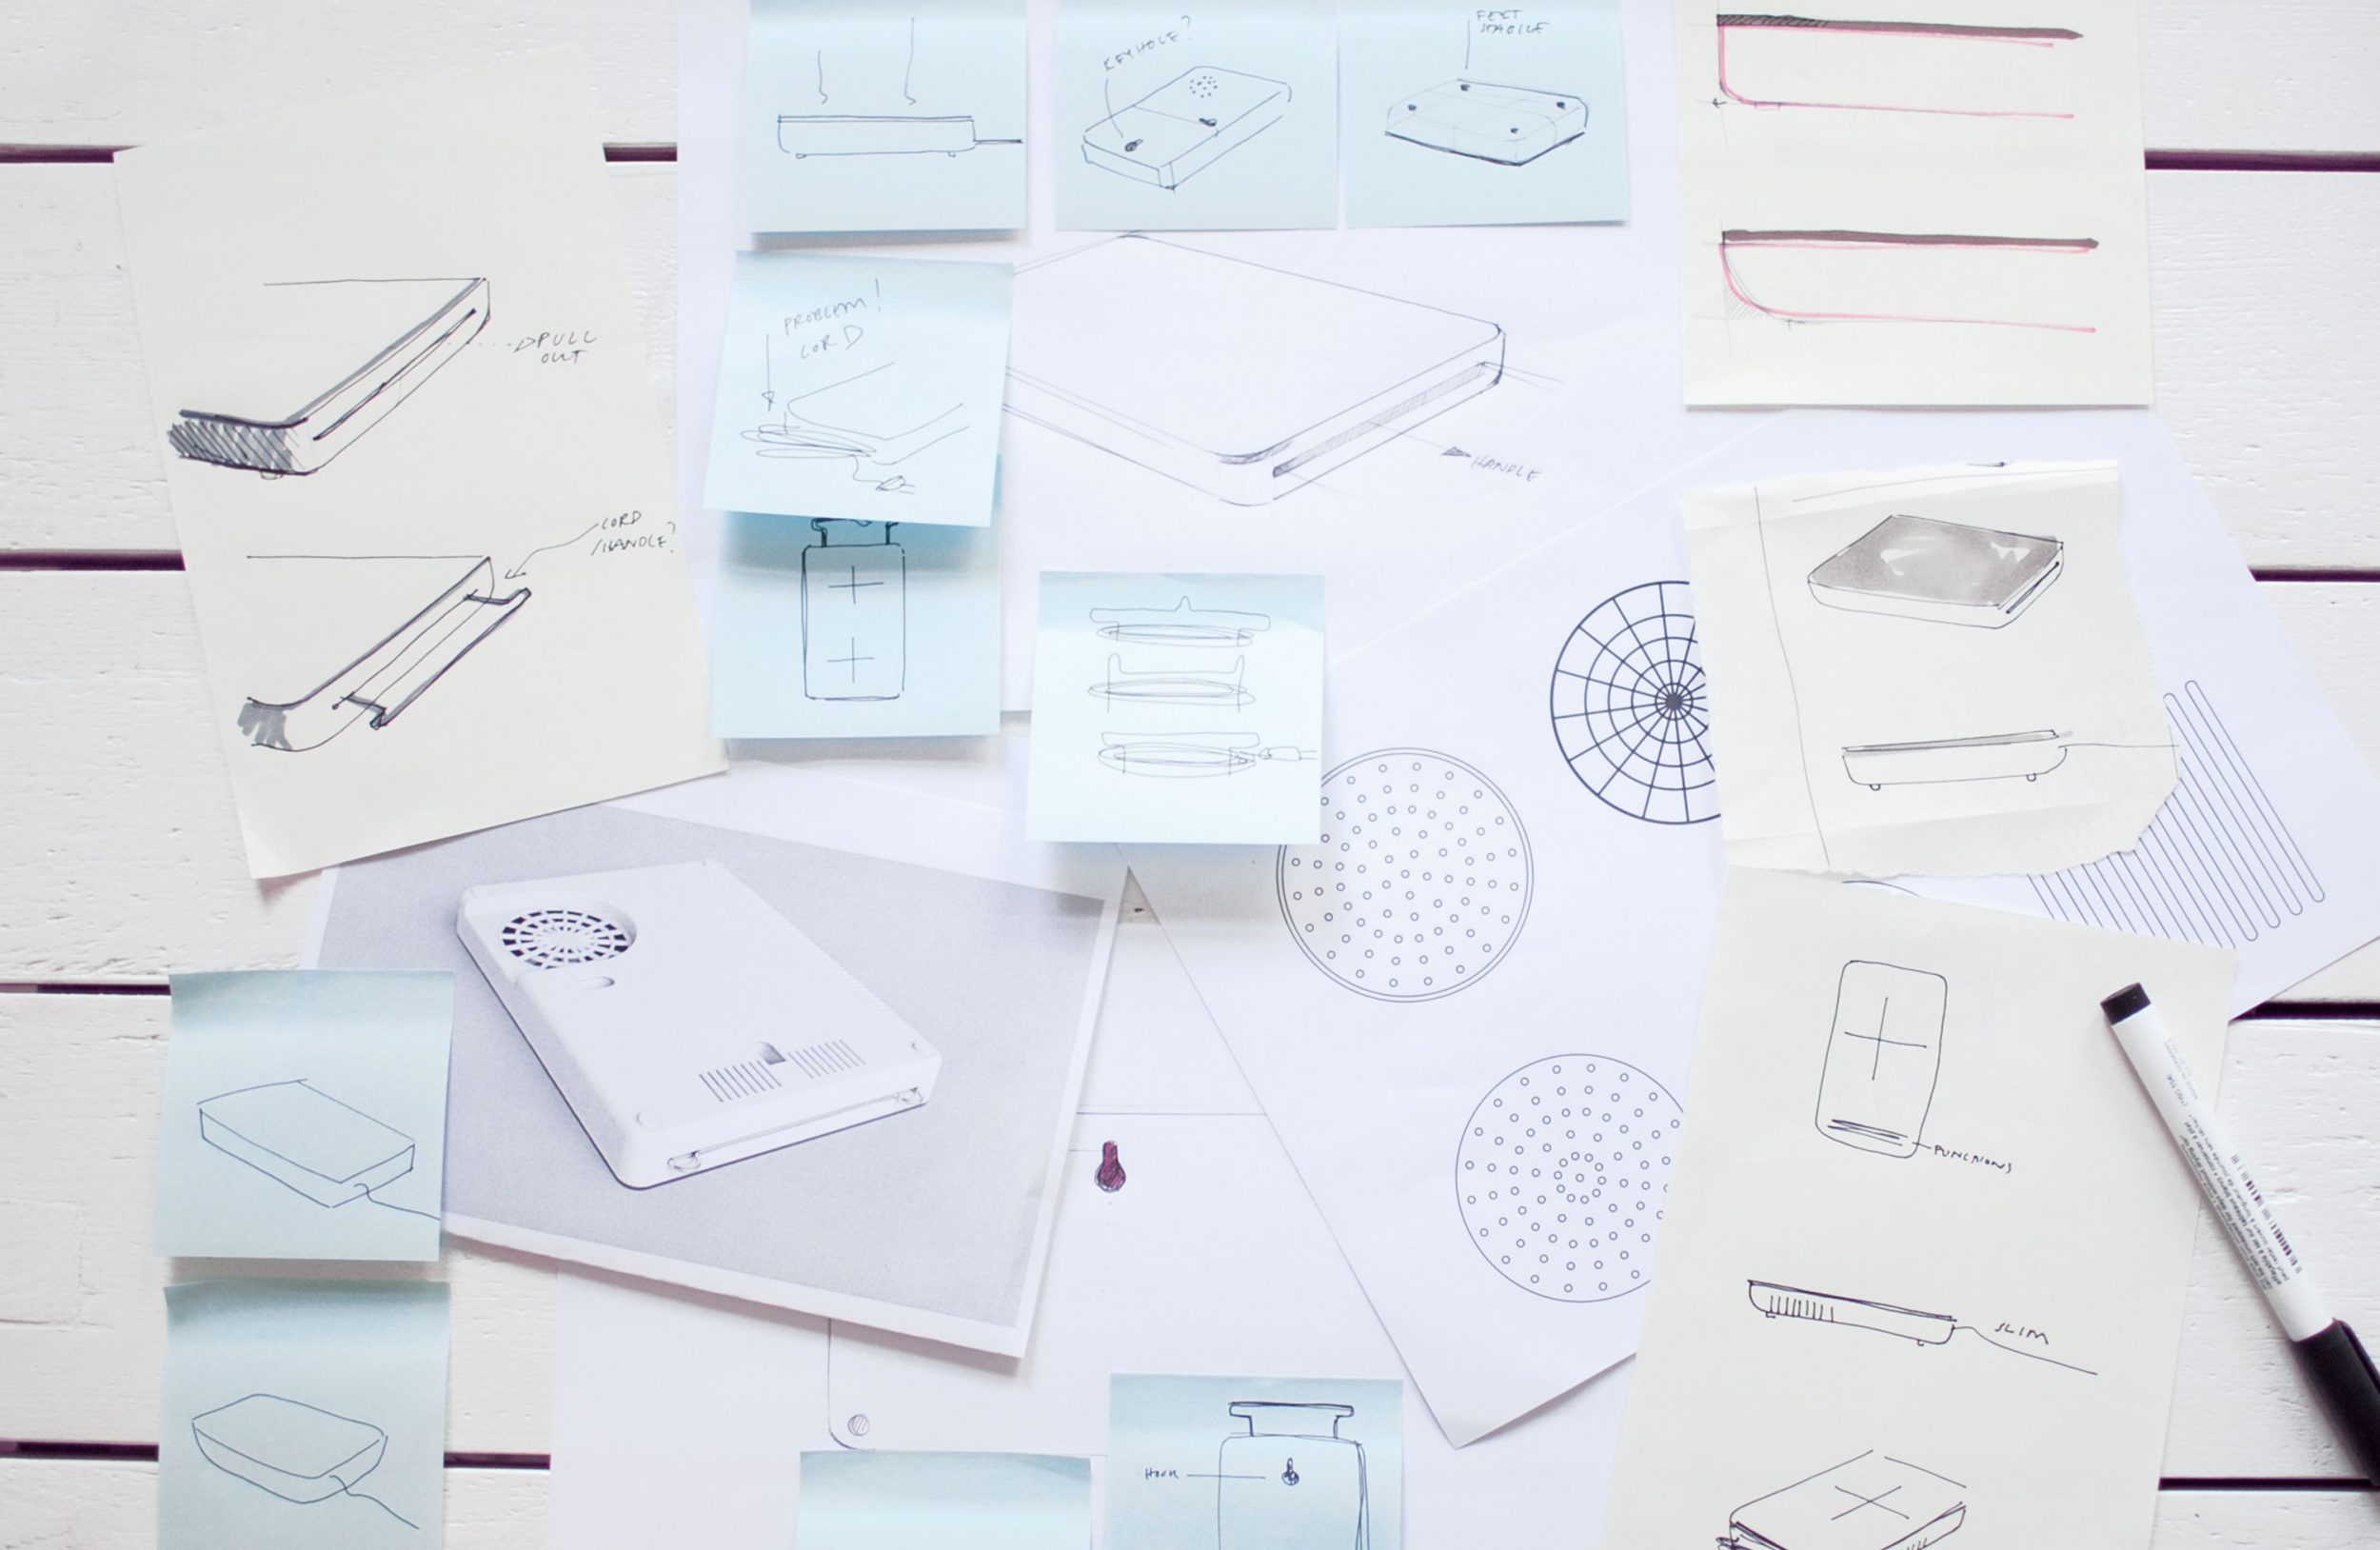 IKEA_today_TILLREDA_sketches-2500x1628.jpg